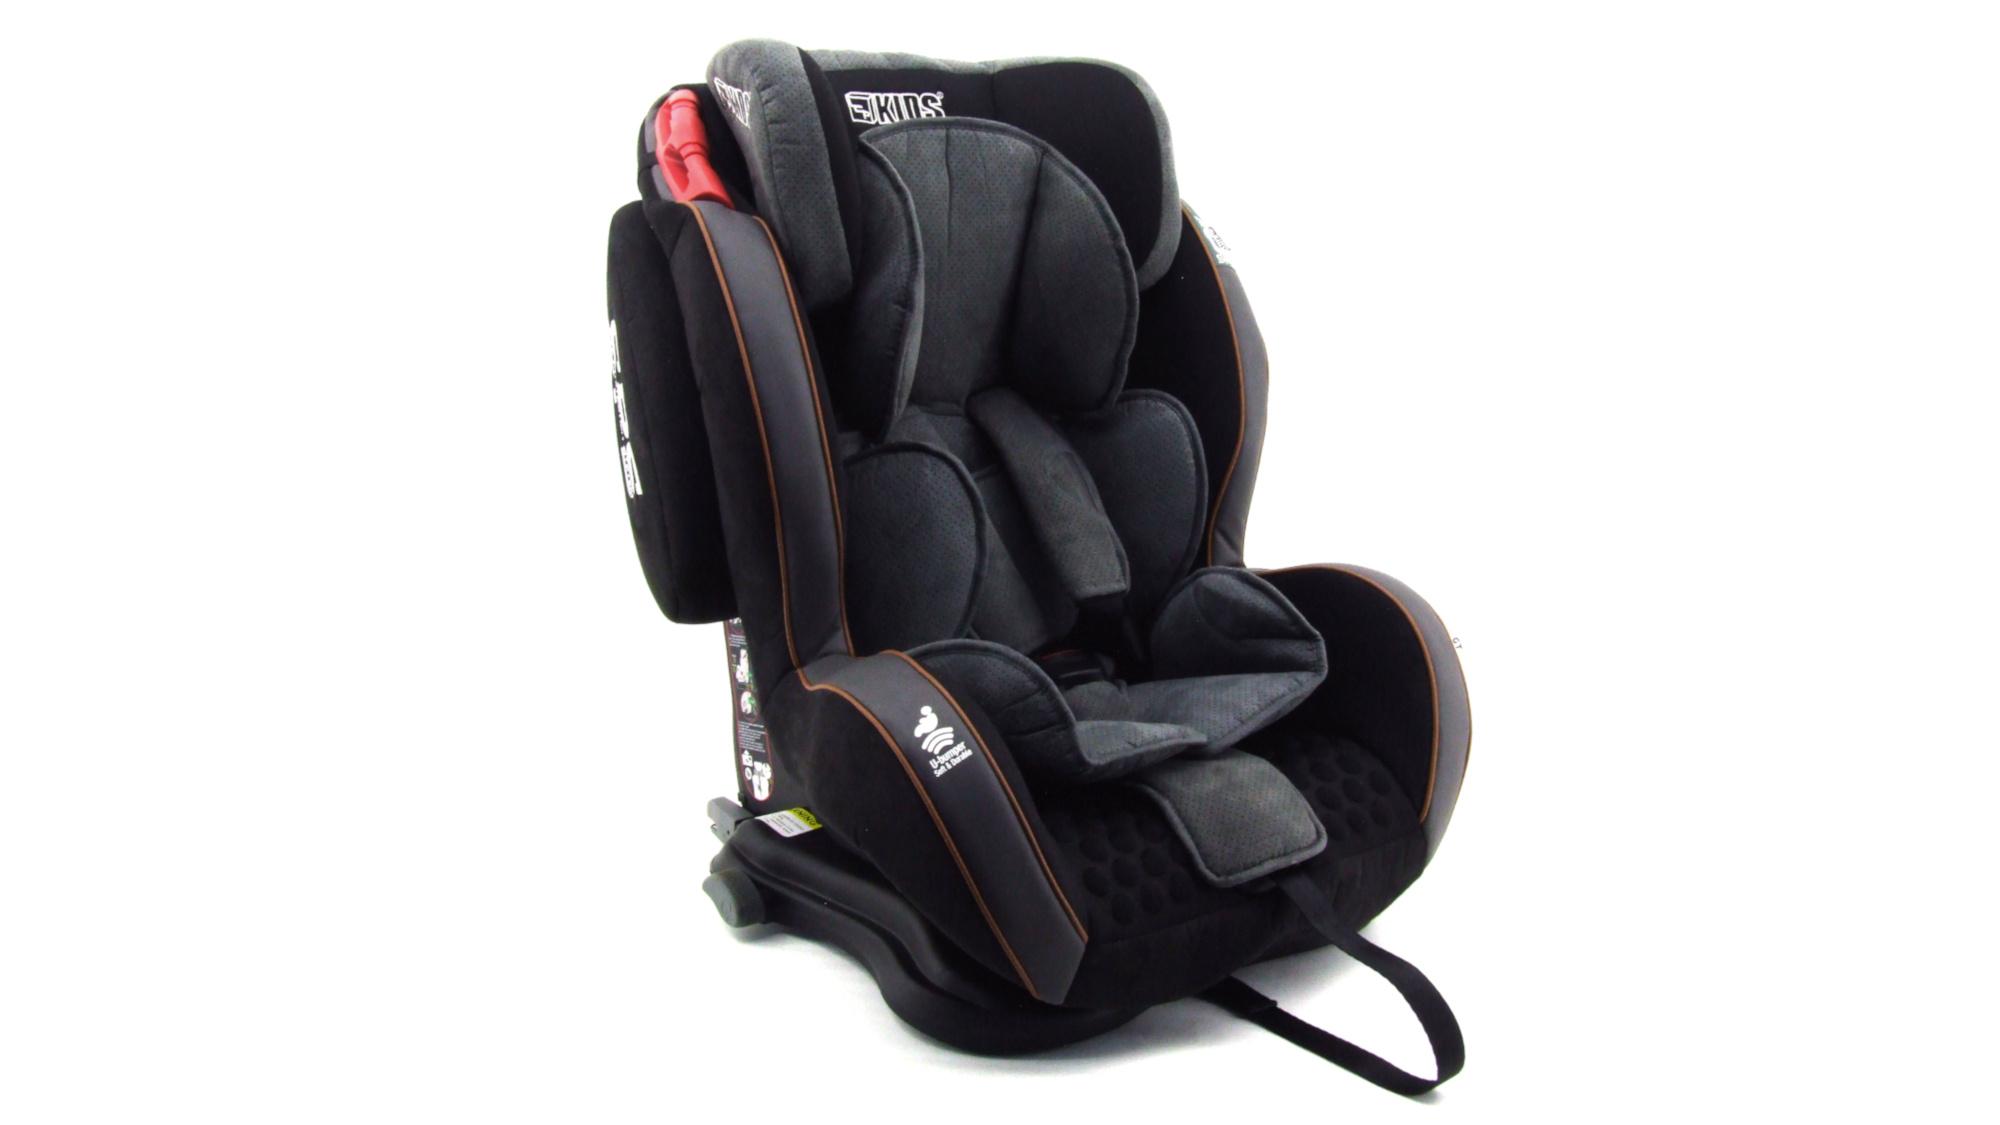 Kindersitz Isofix leihen